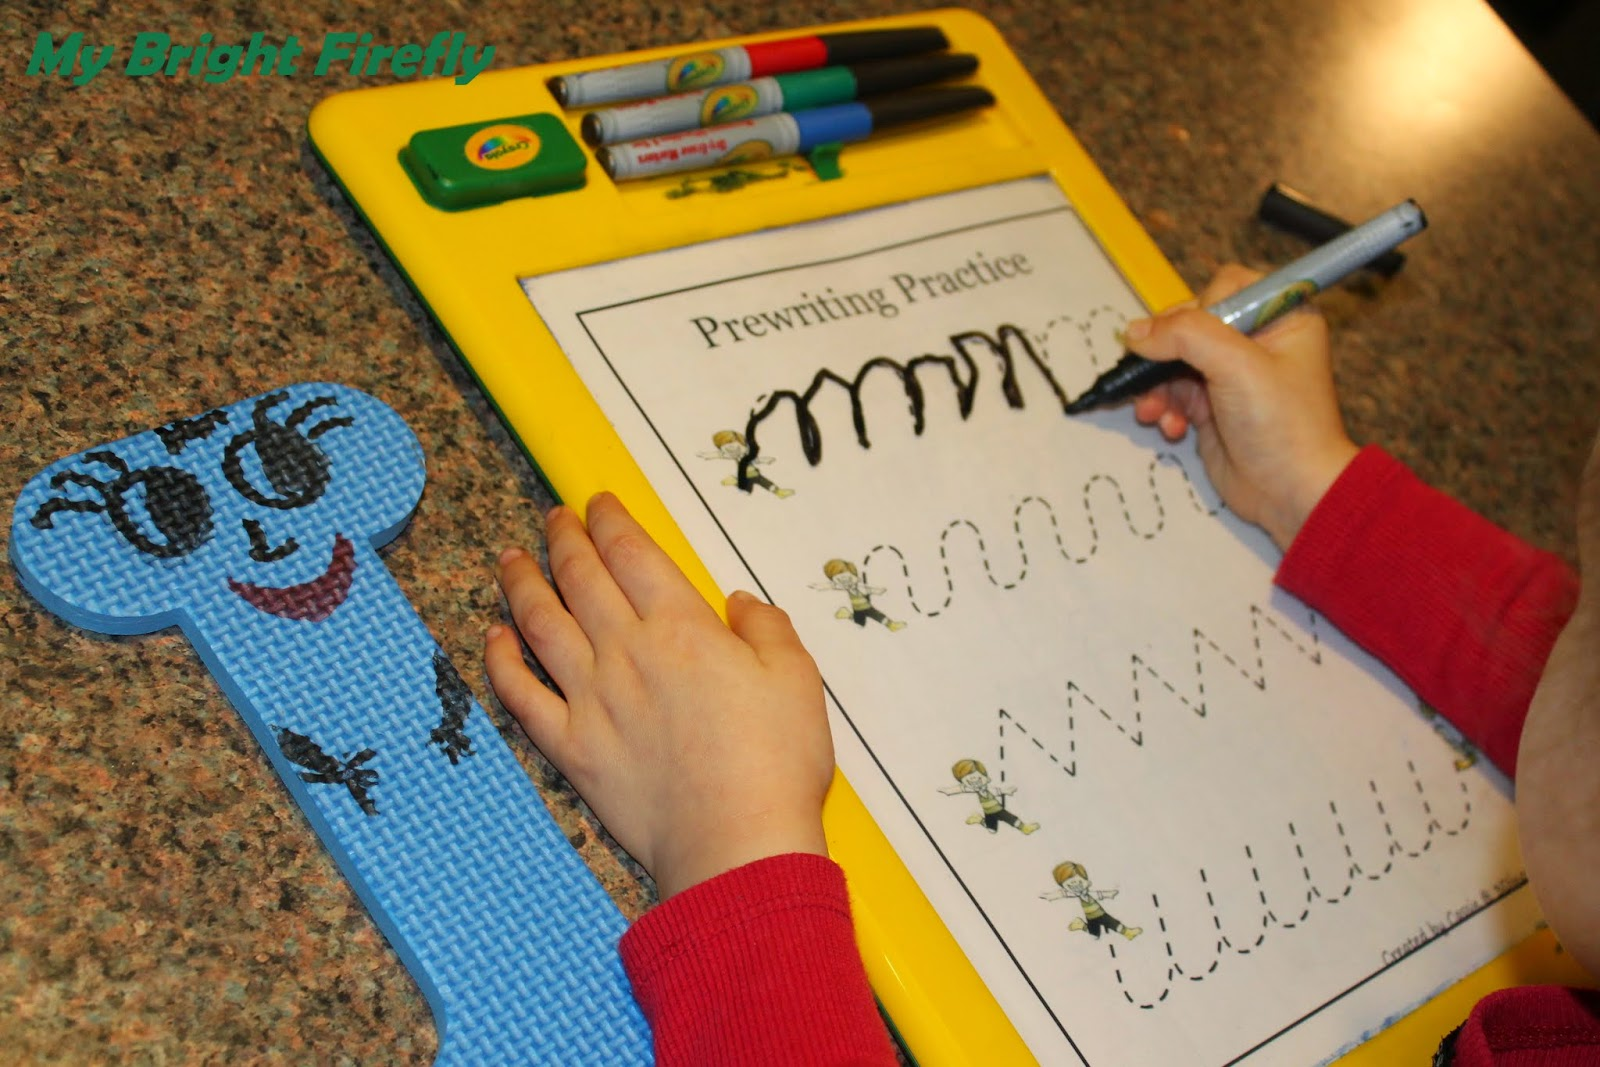 My Bright Firefly Simple Preschool Math Activities